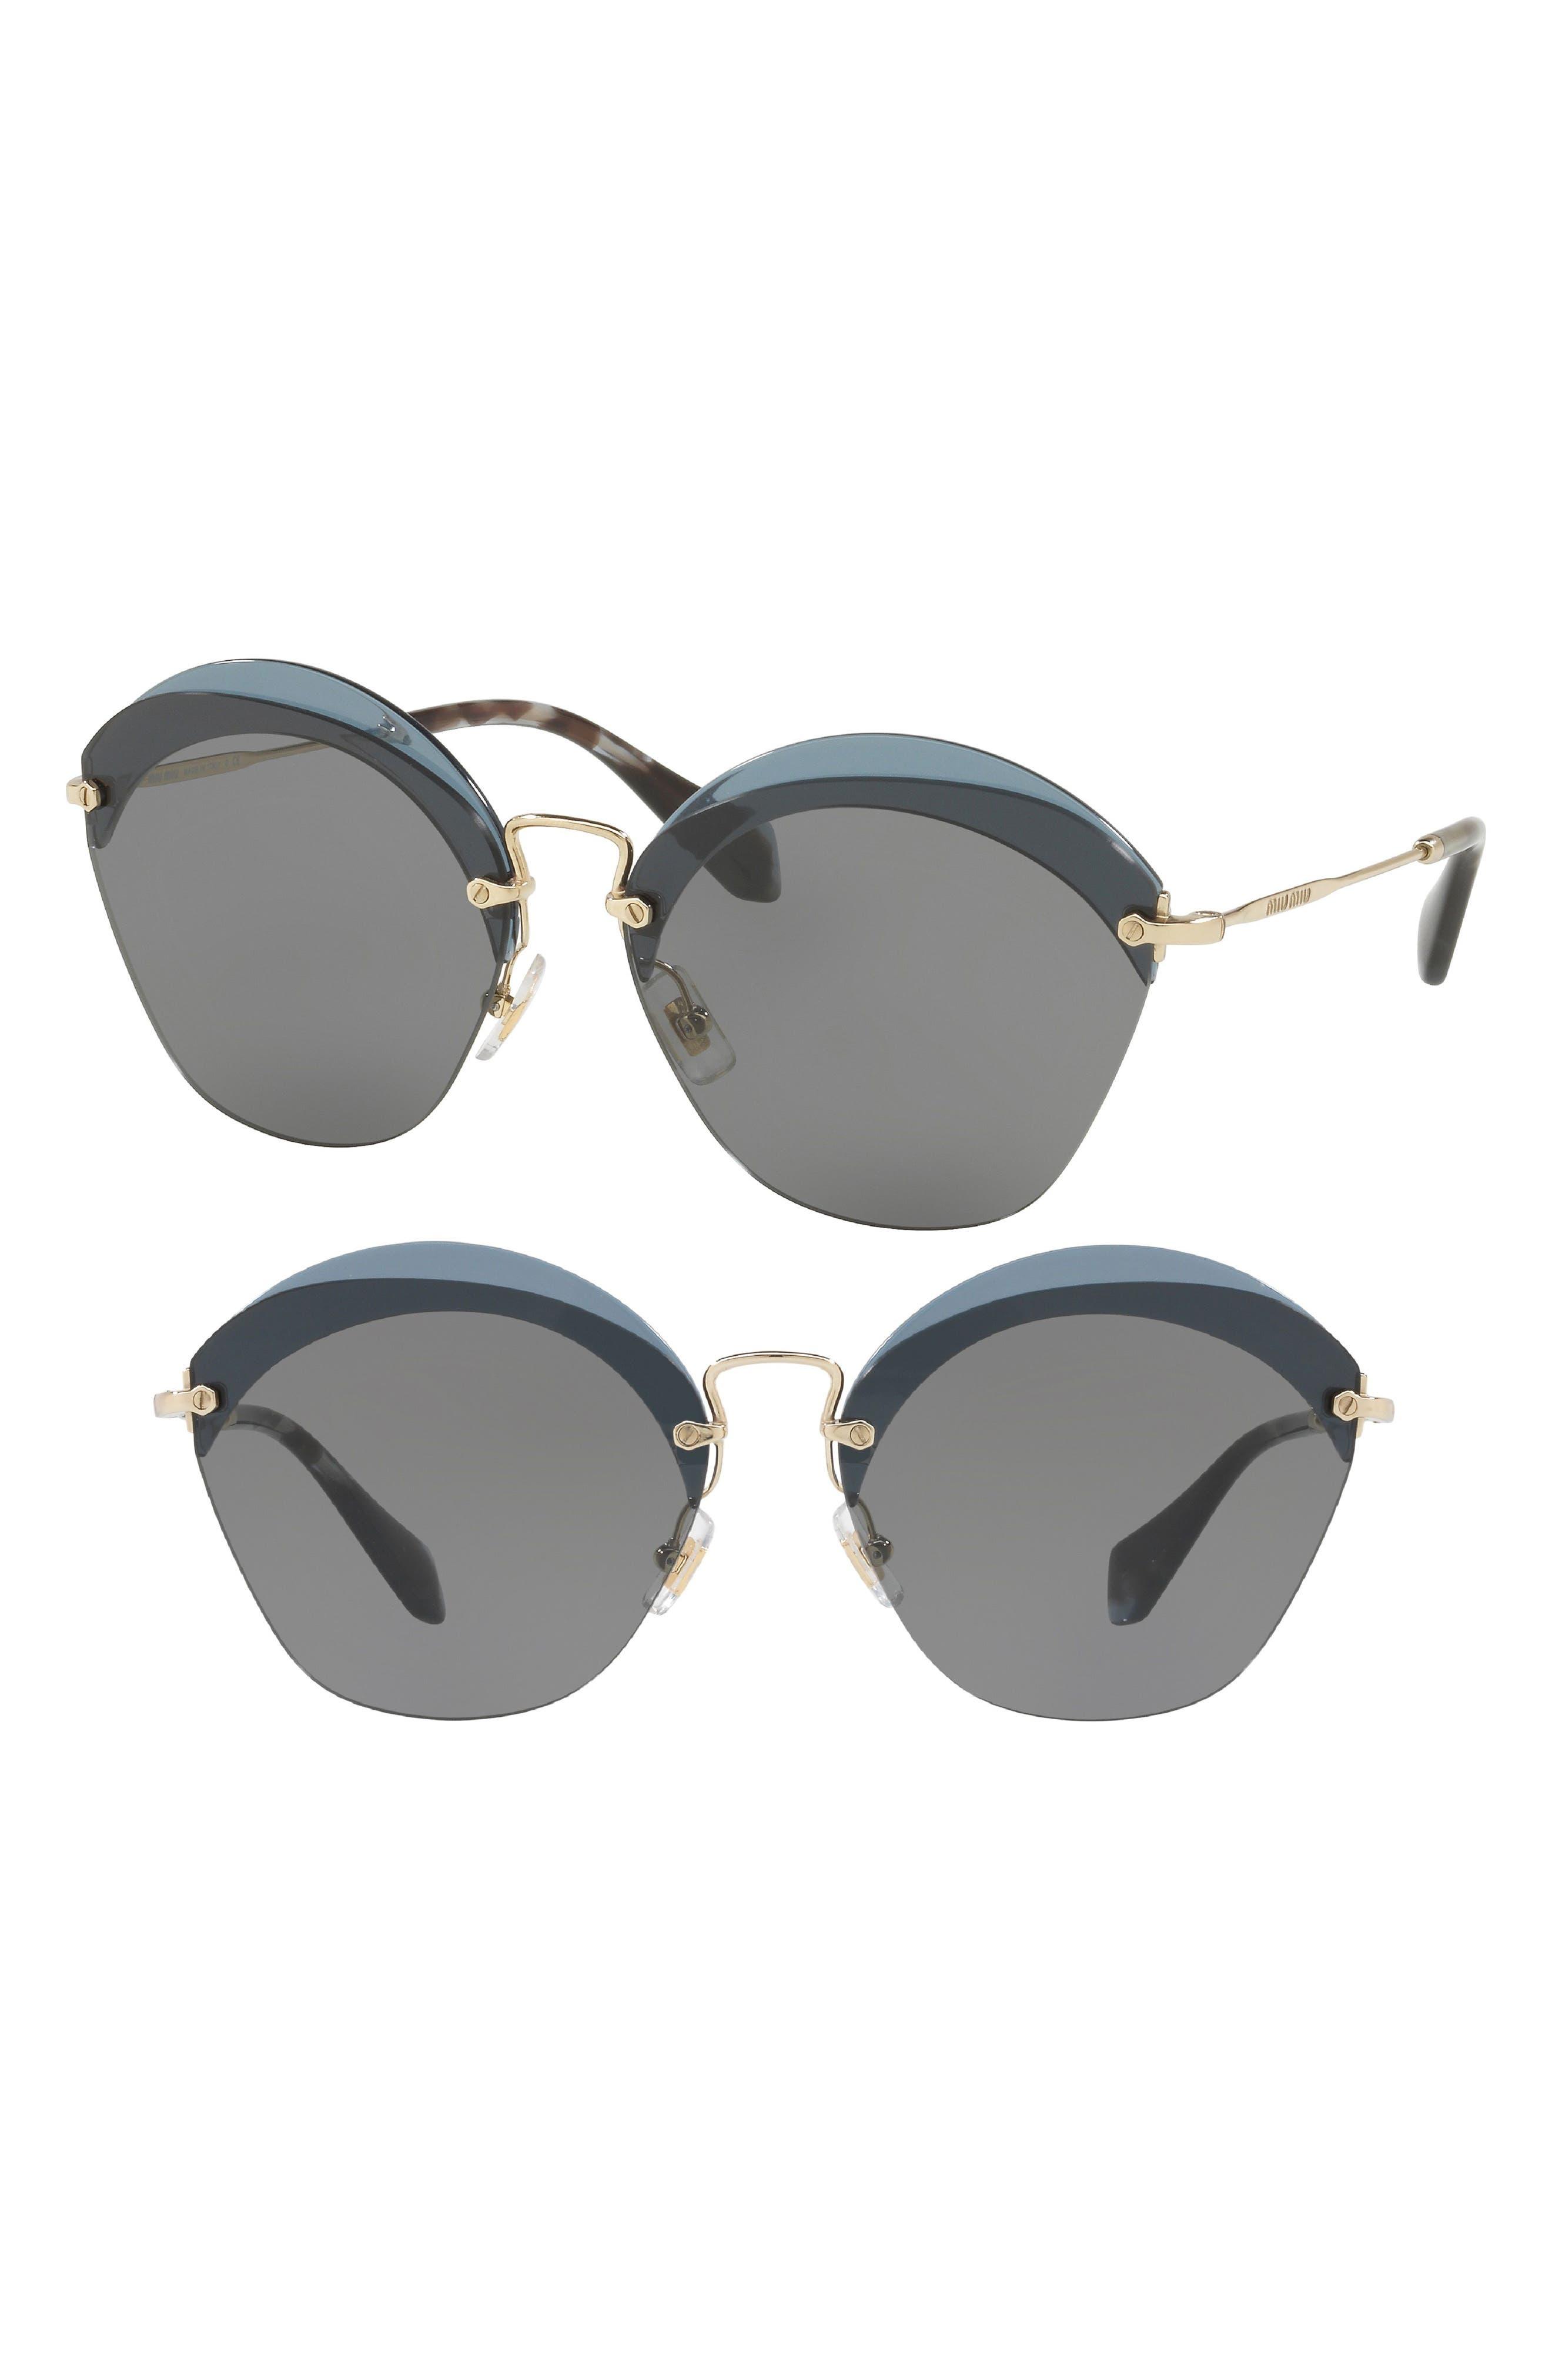 62mm Sunglasses,                             Main thumbnail 1, color,                             TRANSPARENT BLUE SOLID